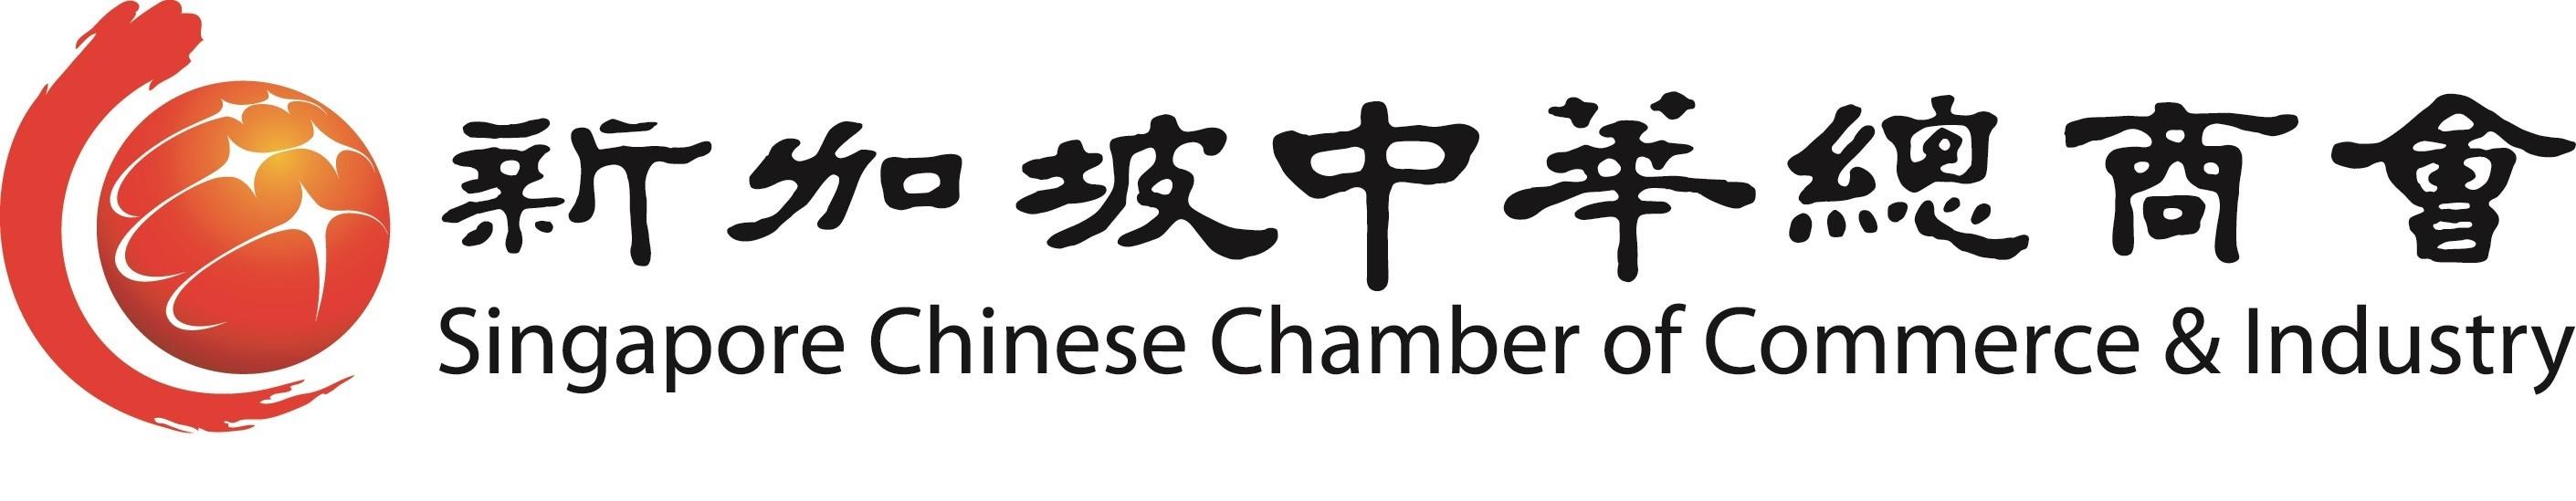 SCCCI_logo_CMYK